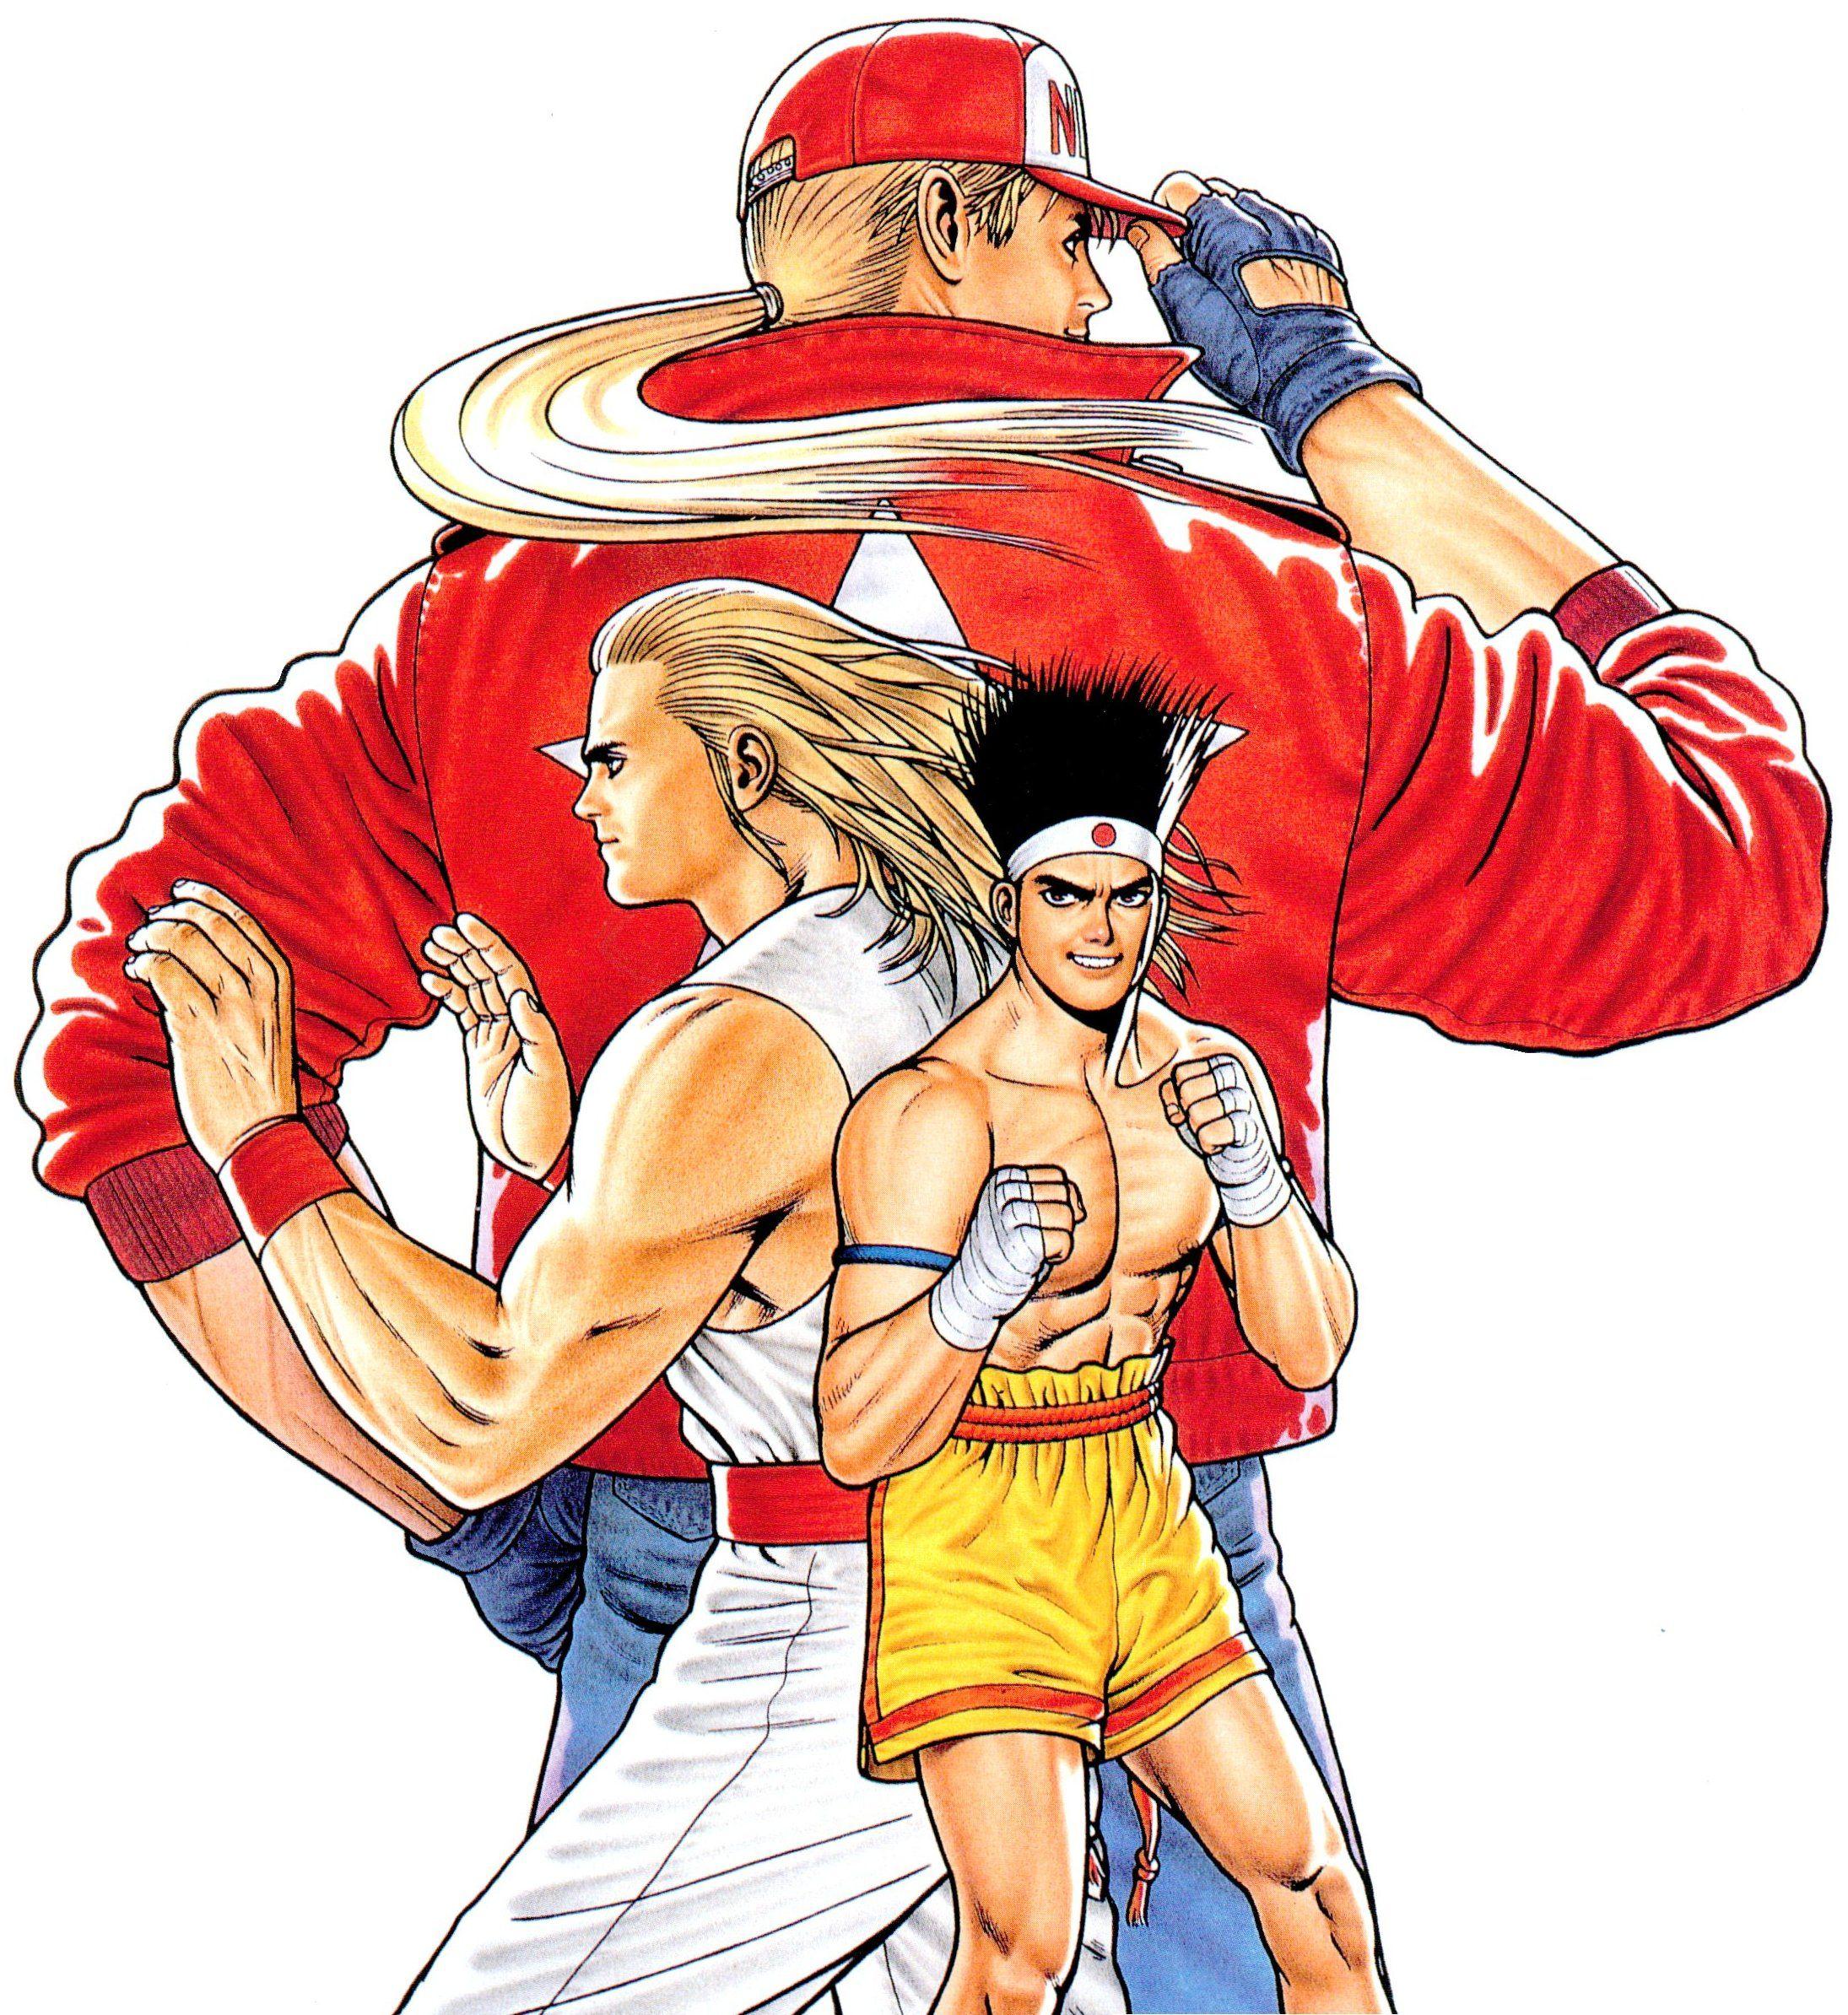 Fatal Fury   Art of fighting, Video game genre, Game art